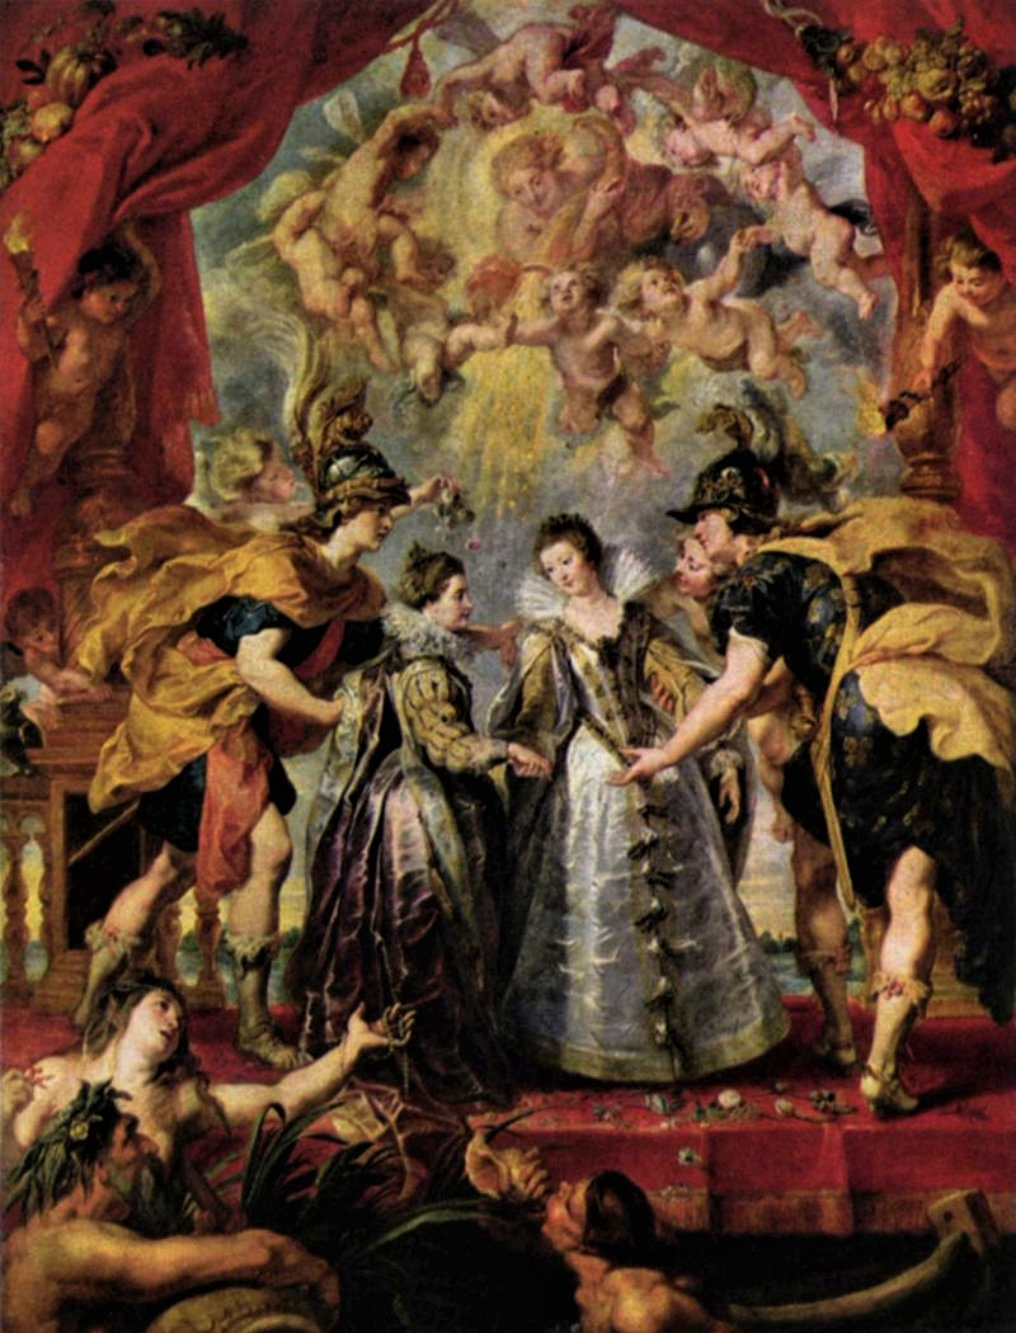 Картина Рубенса «Обмен принцессами»  9 ноября 1615 года. Галерея Медичи в Лувре материал холст, масло размер 394x295 Музей